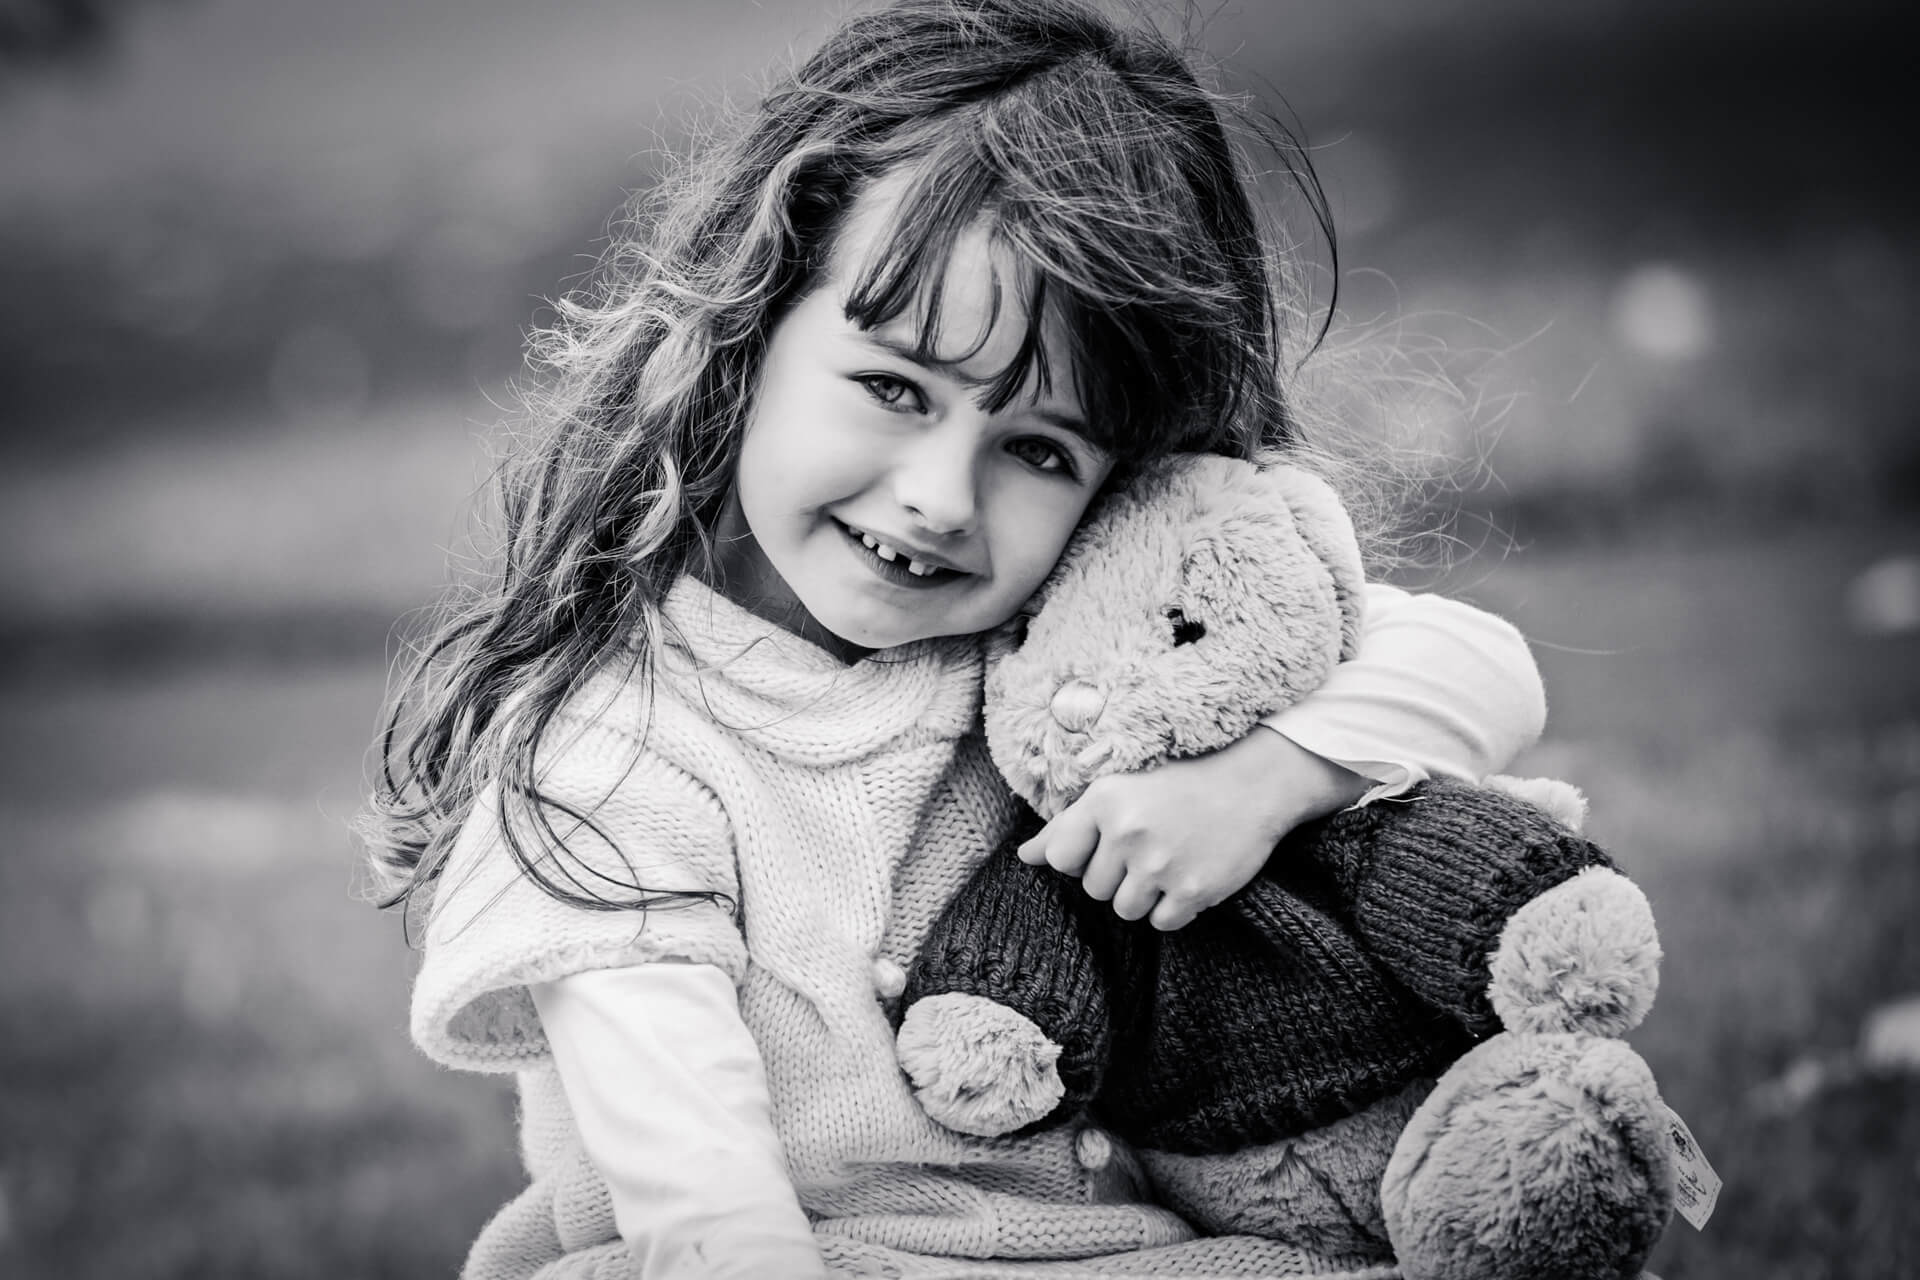 little girl cuddling her teddy bear